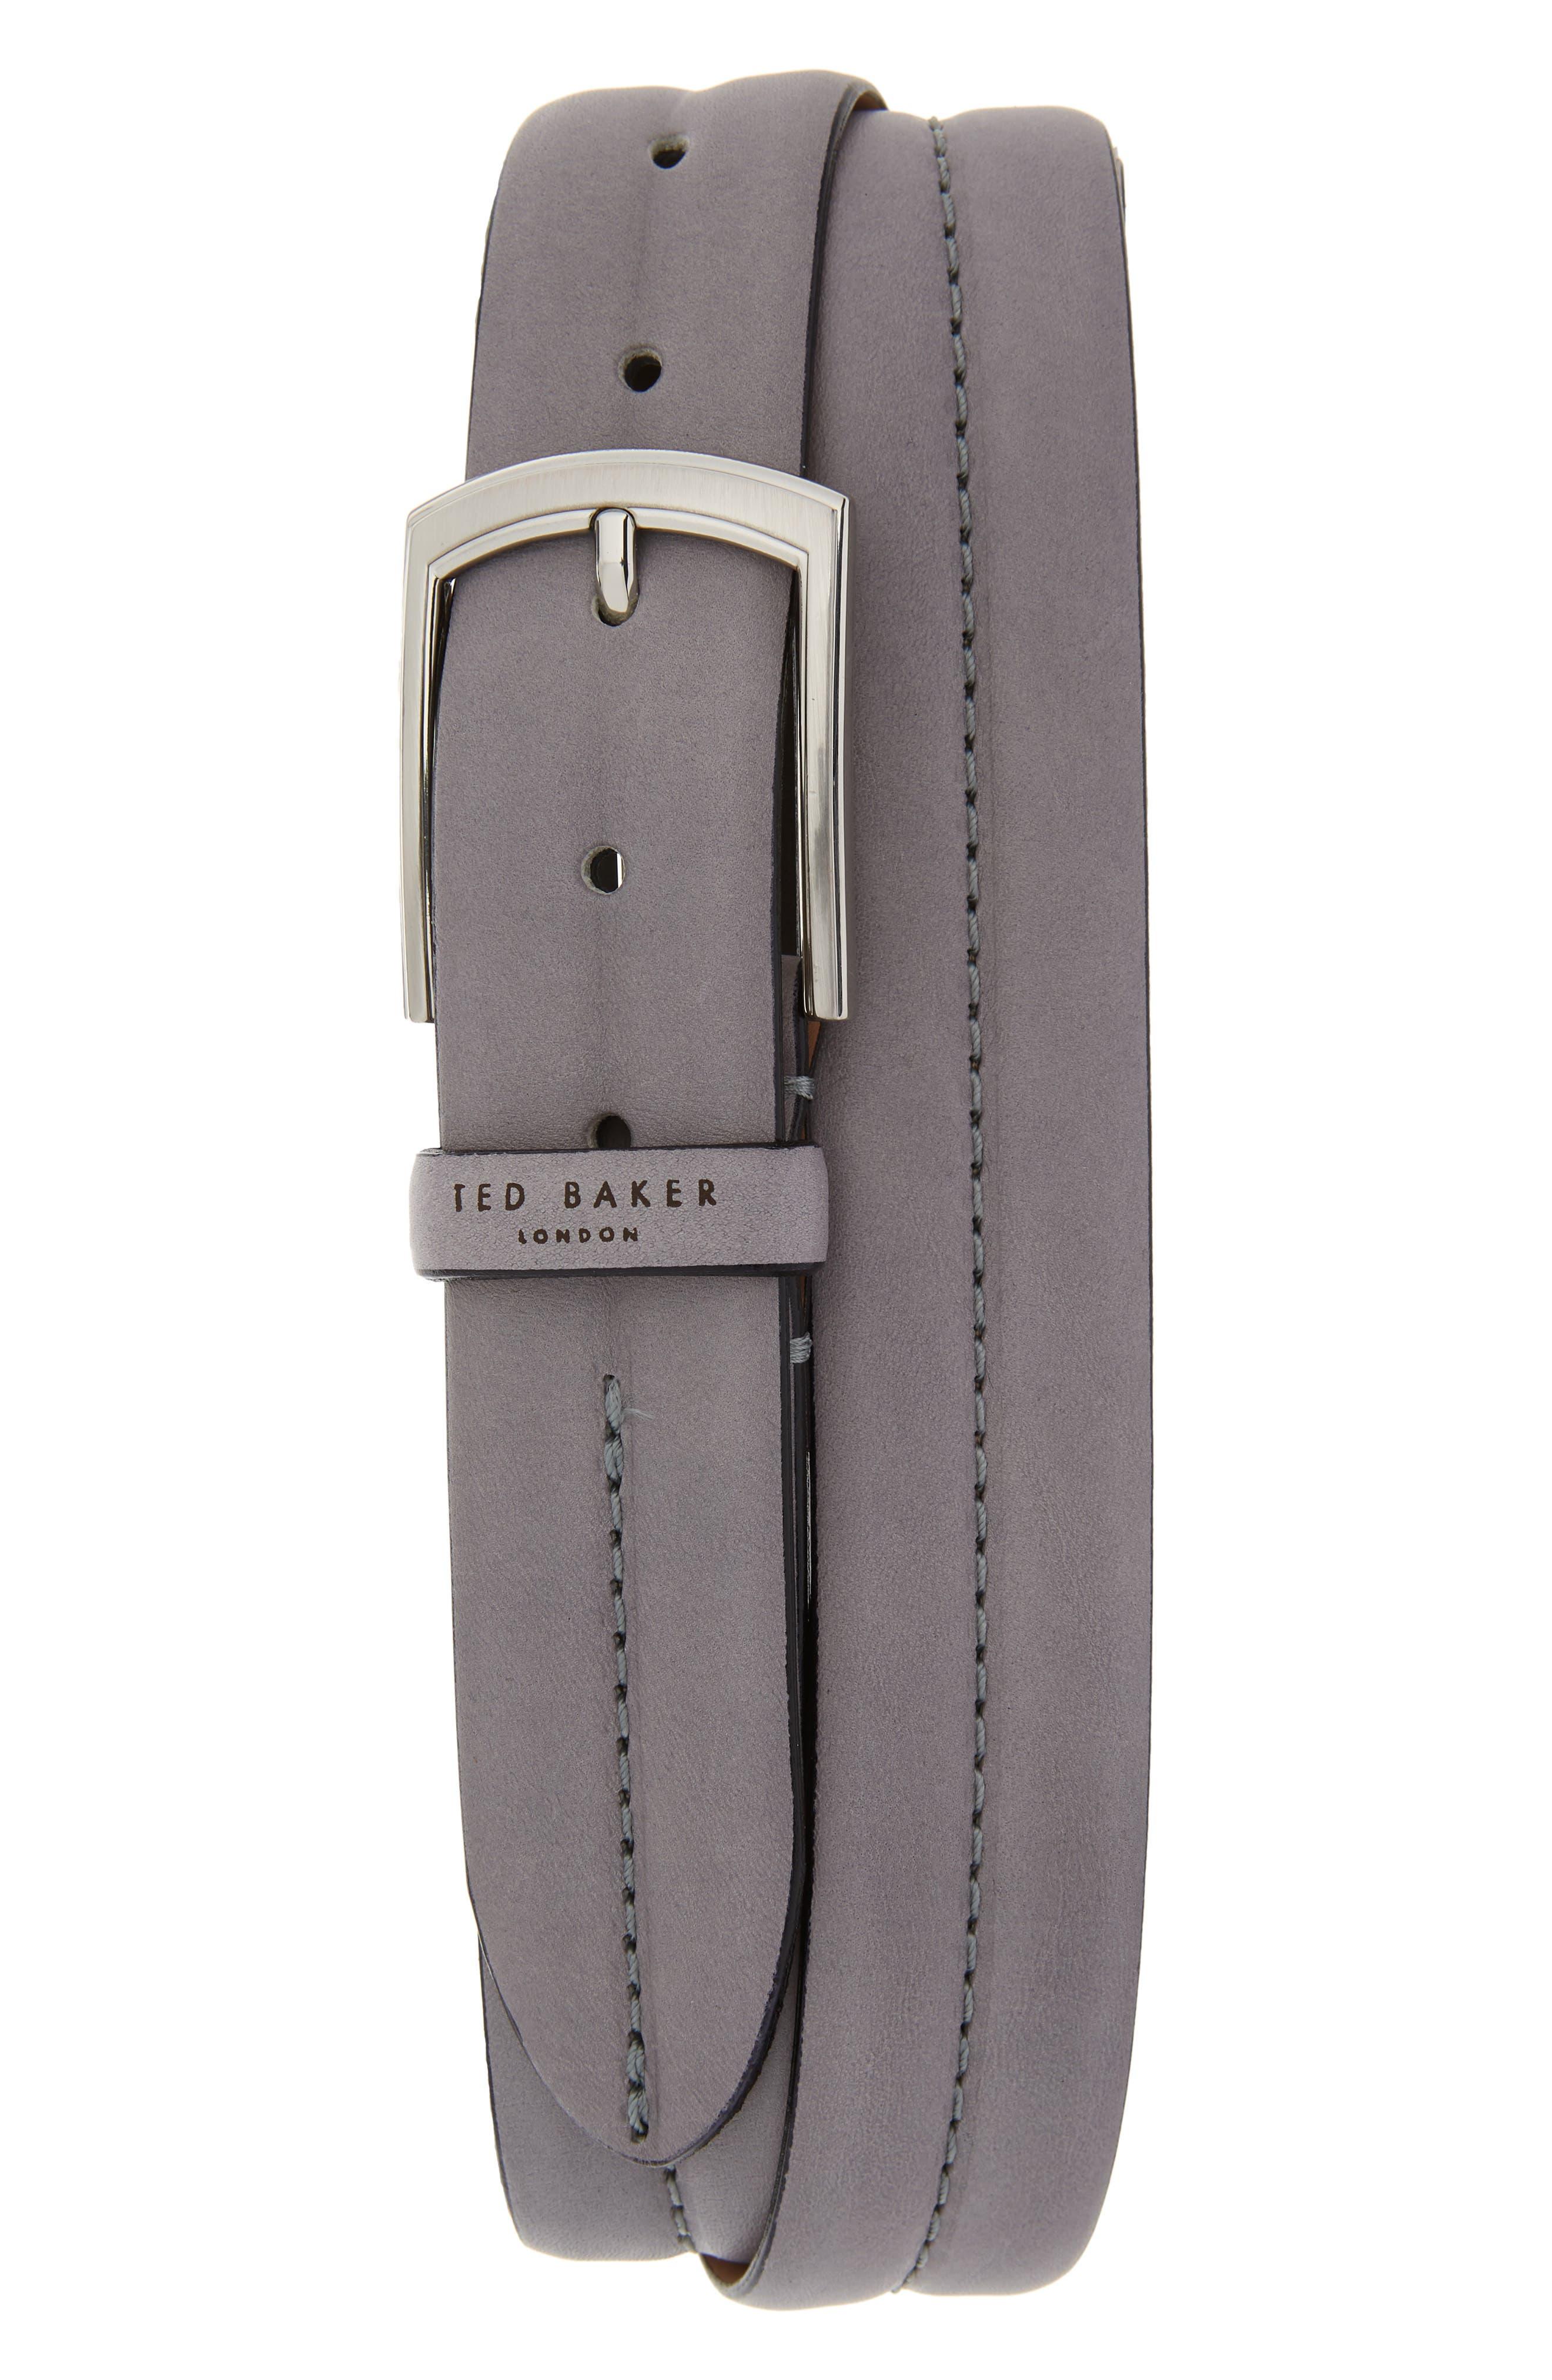 Ted Baker London Stitched Leather Belt, Grey